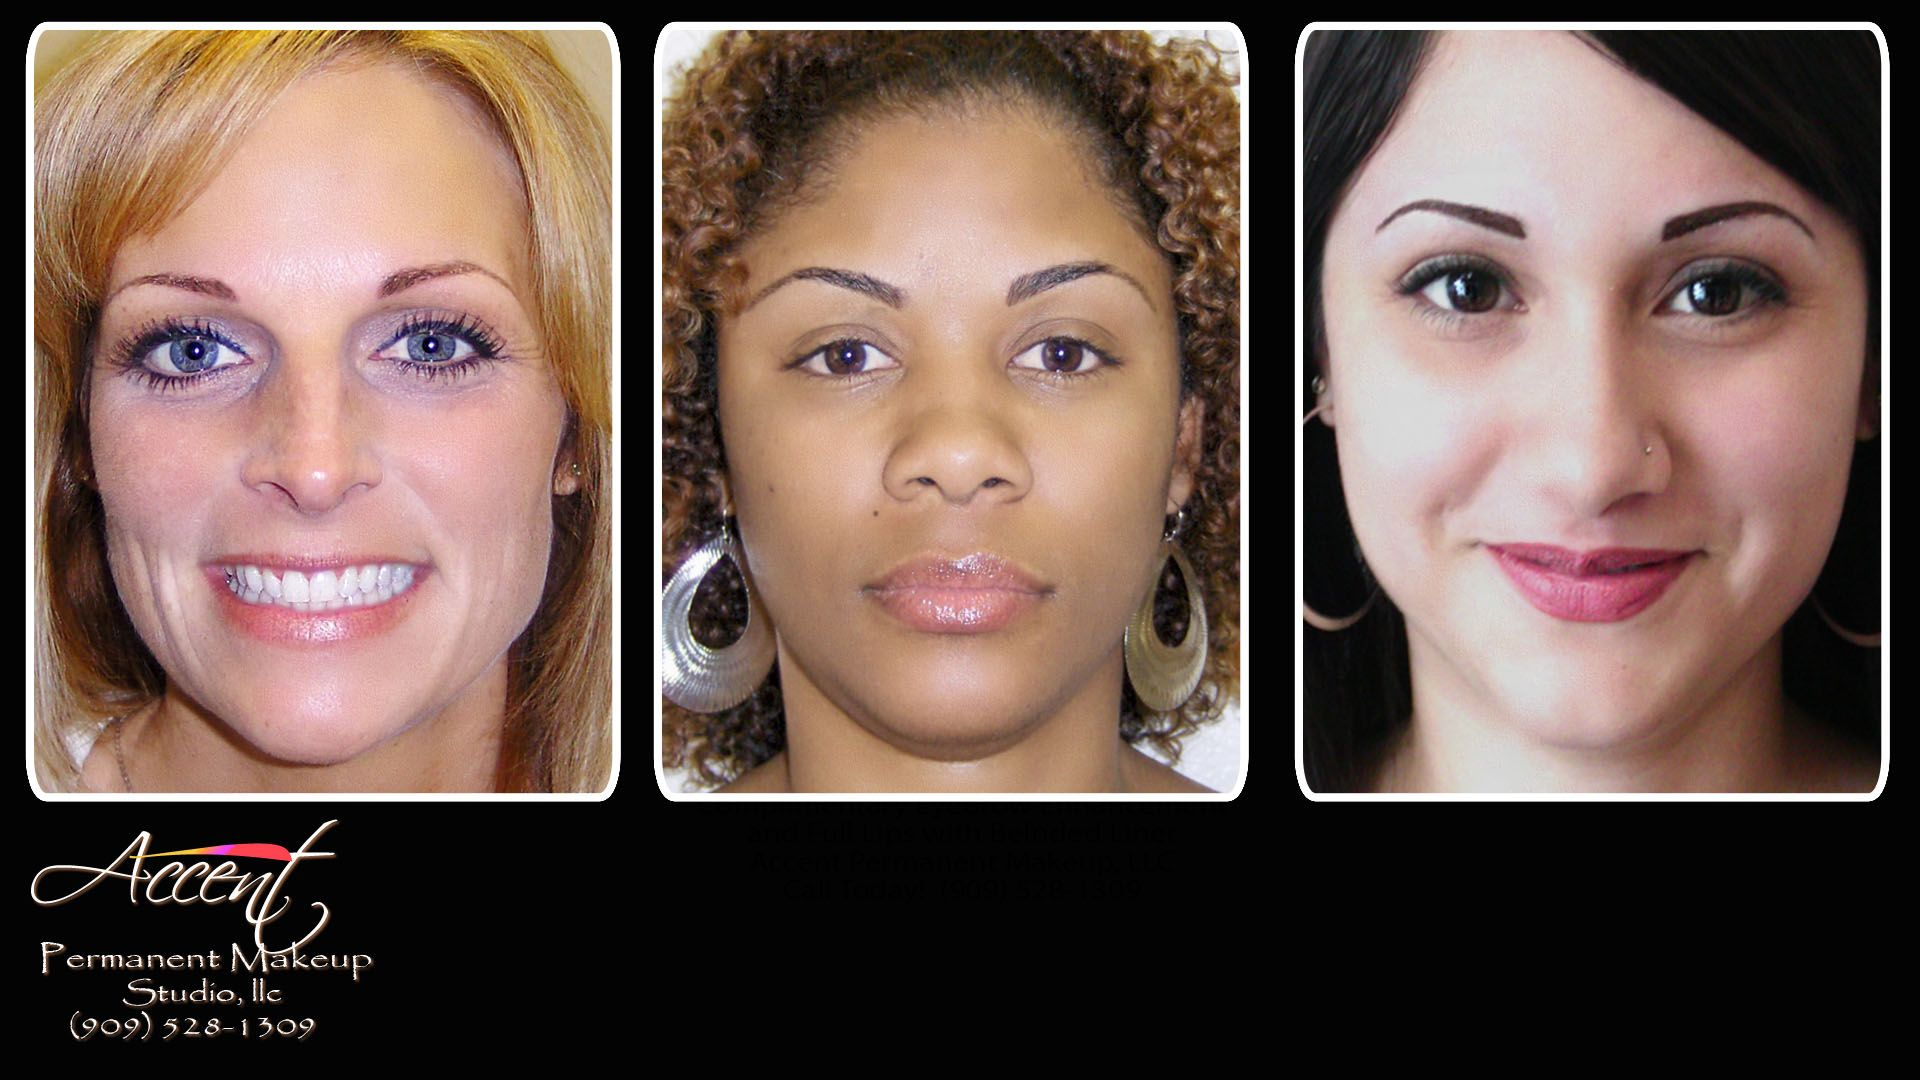 Permanent makeup Makeup, Microneedling